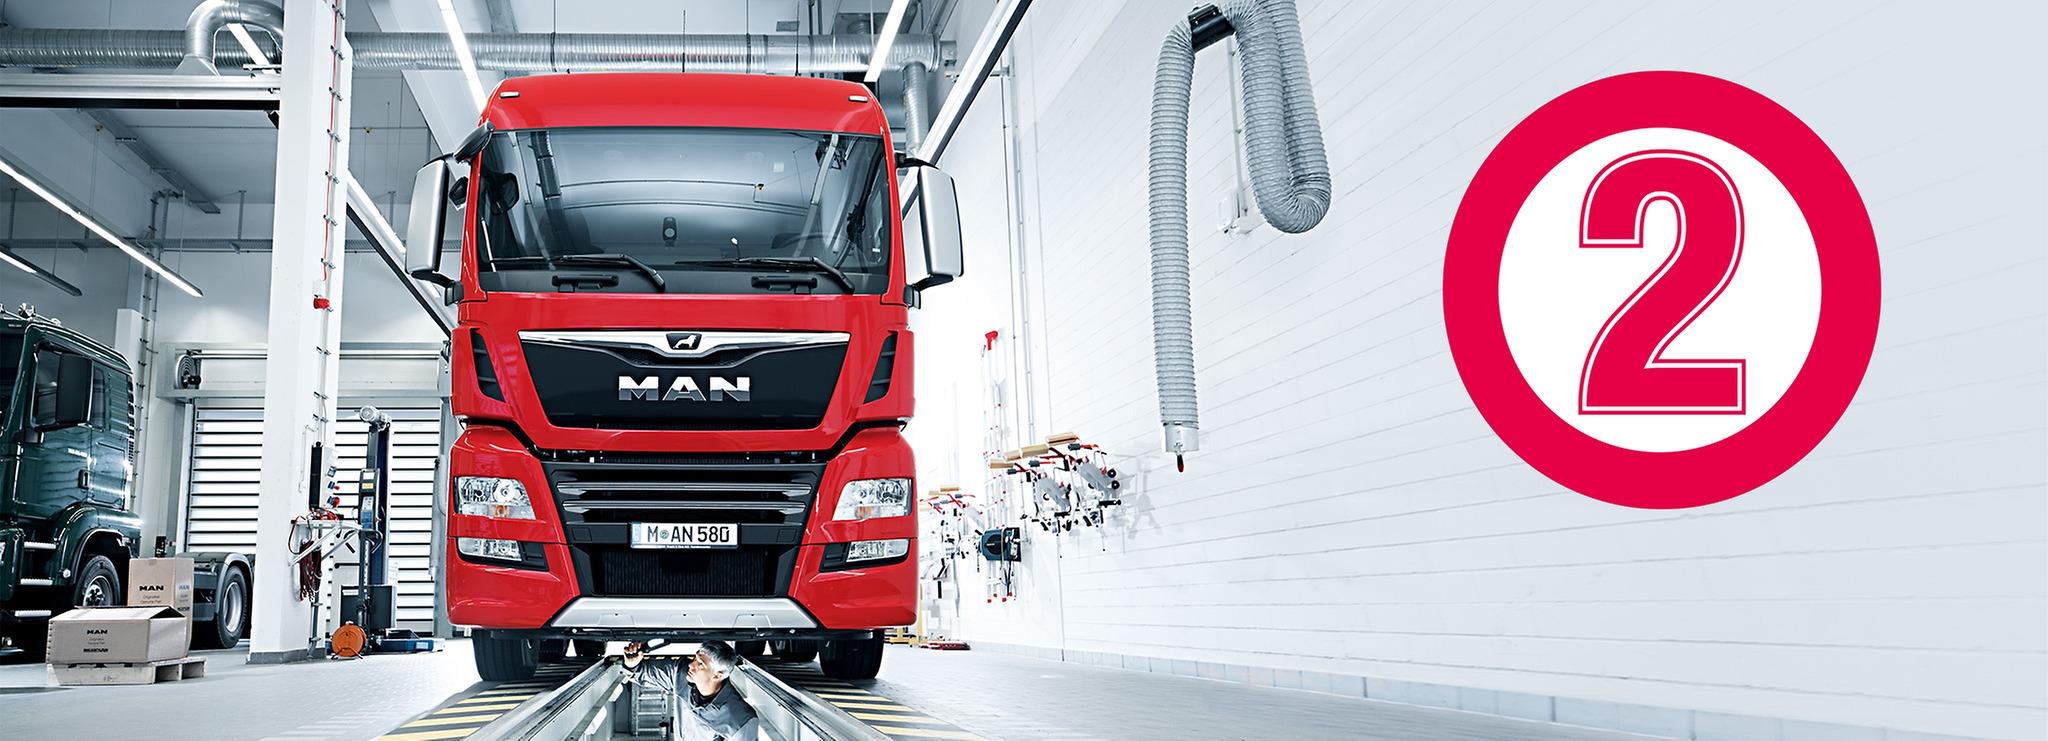 T_Stage_MANGarantie_Truck_width_1200_height_434